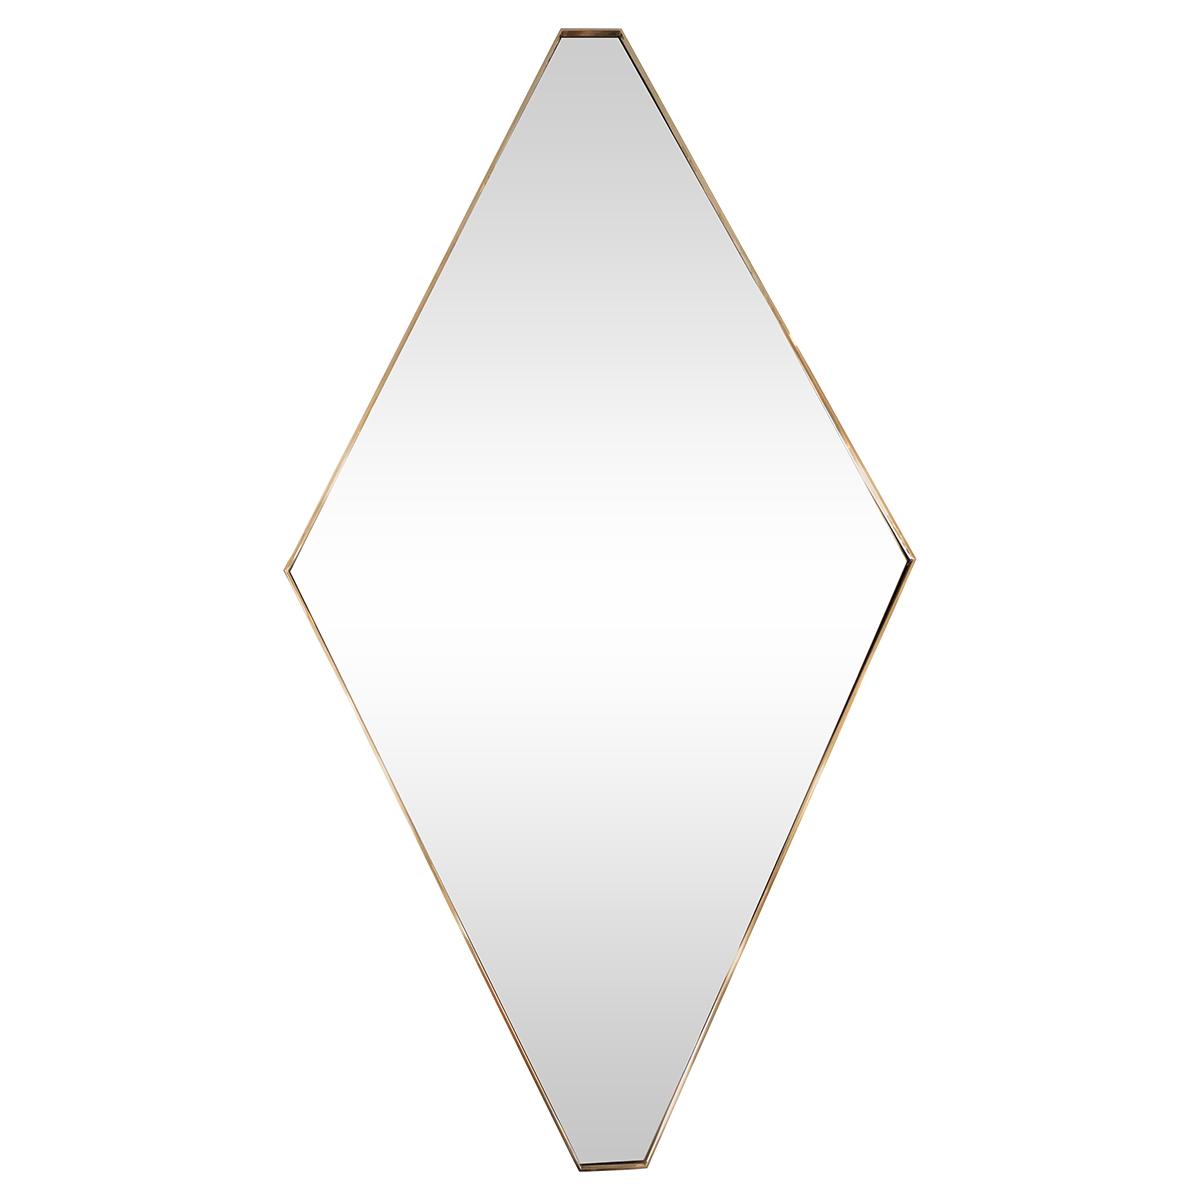 Brass Diamond Shaped Mirror Wall John Salibello